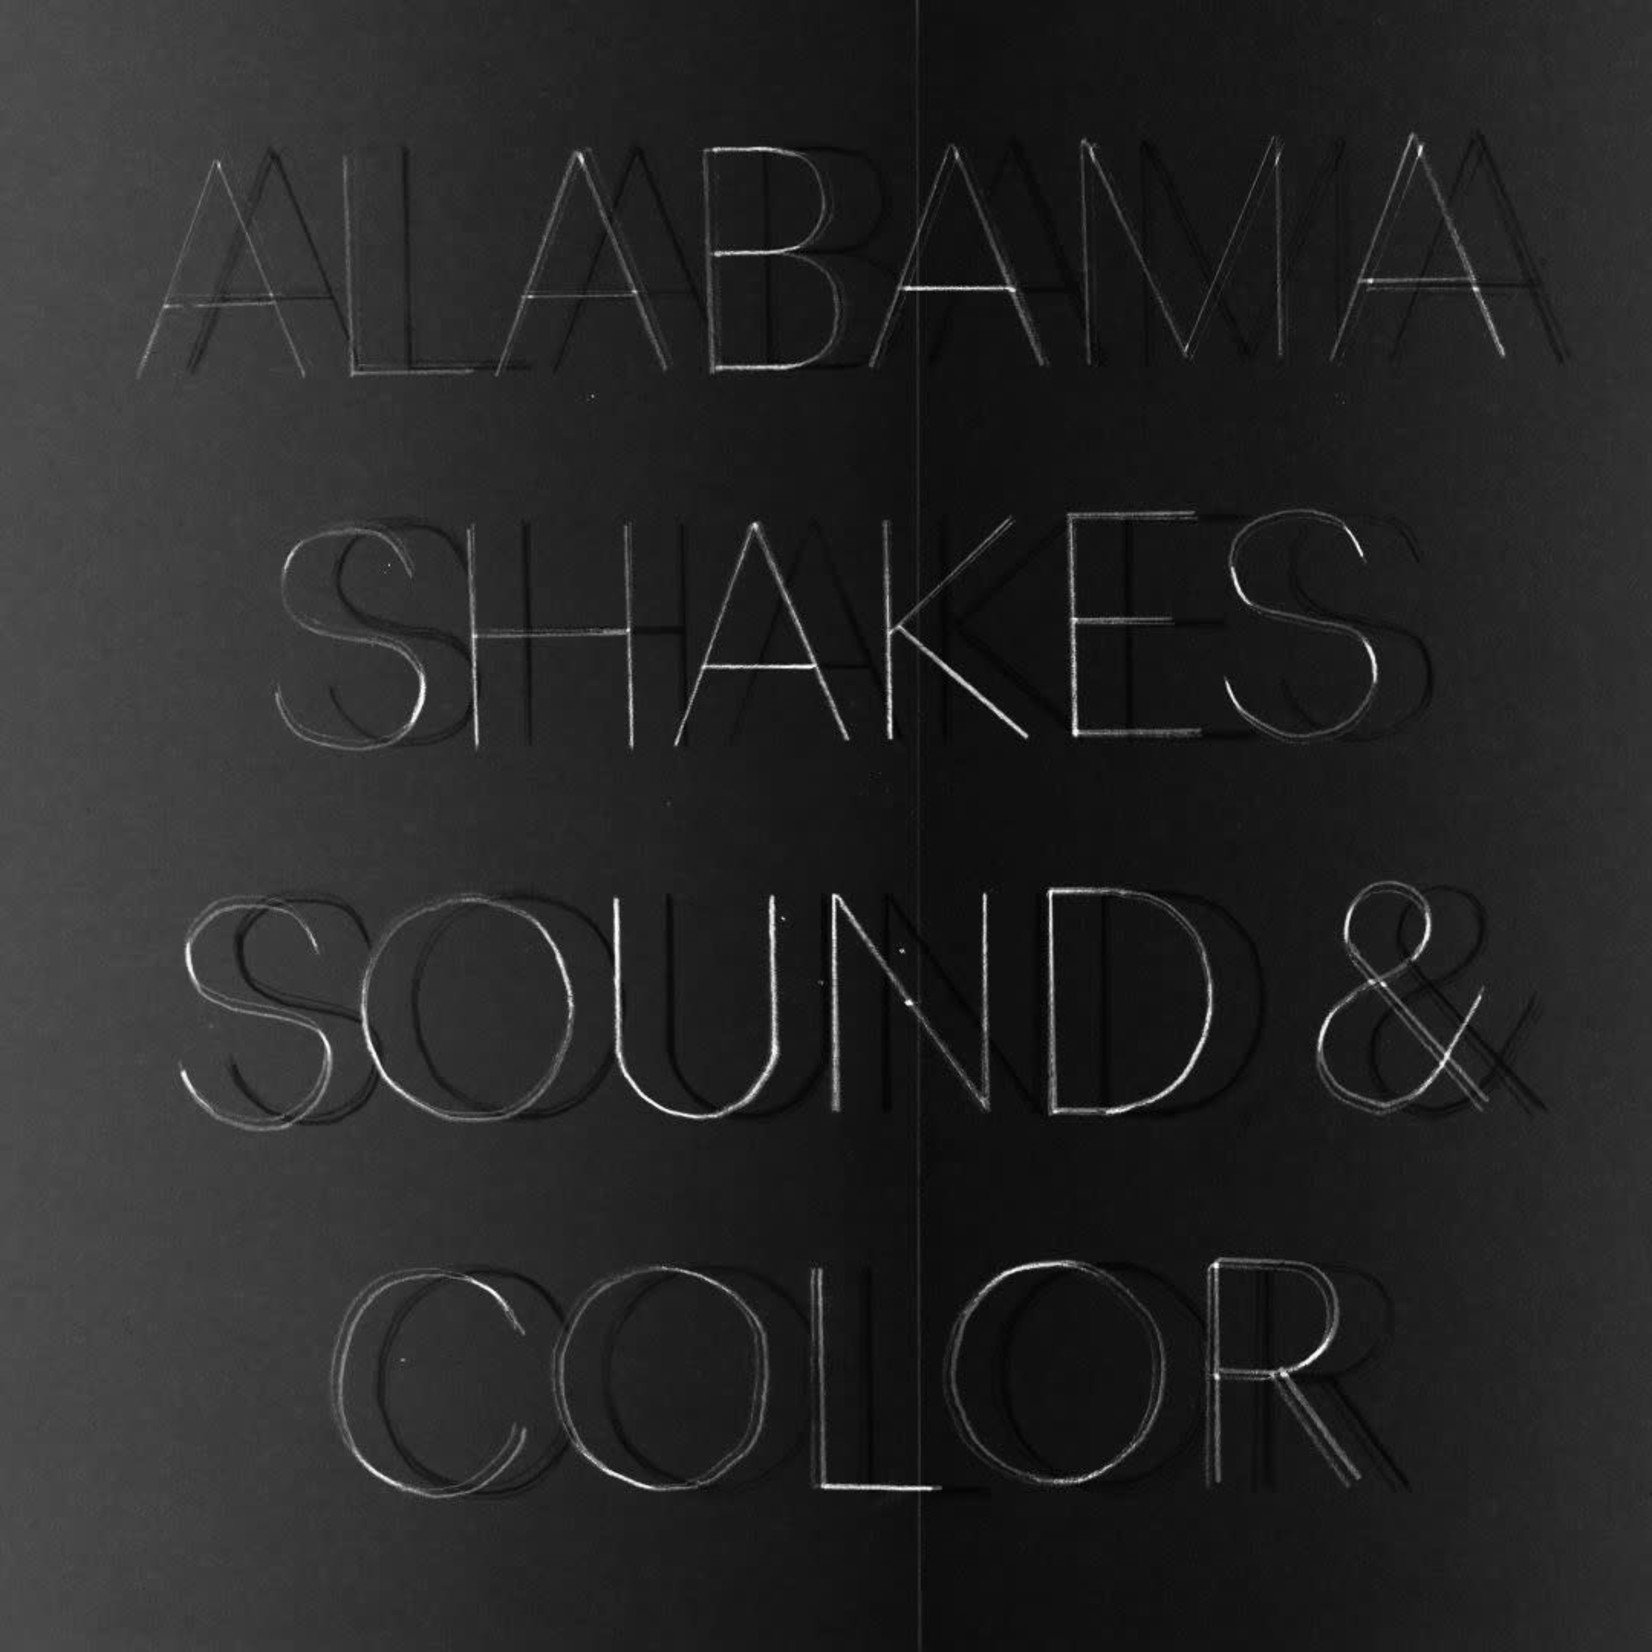 Monostereo Alabama Shakes Sound & Color